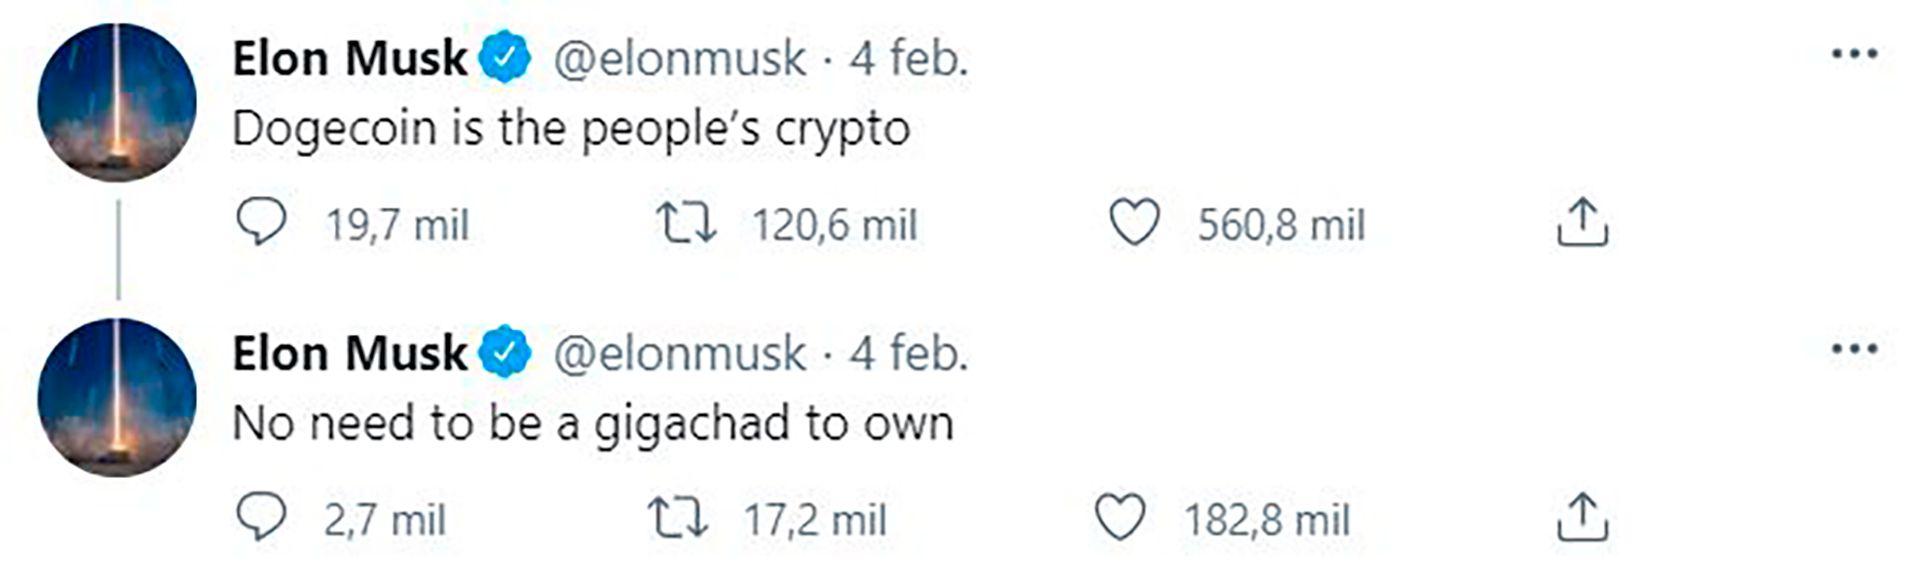 Elon Musk apoya el dogecoin